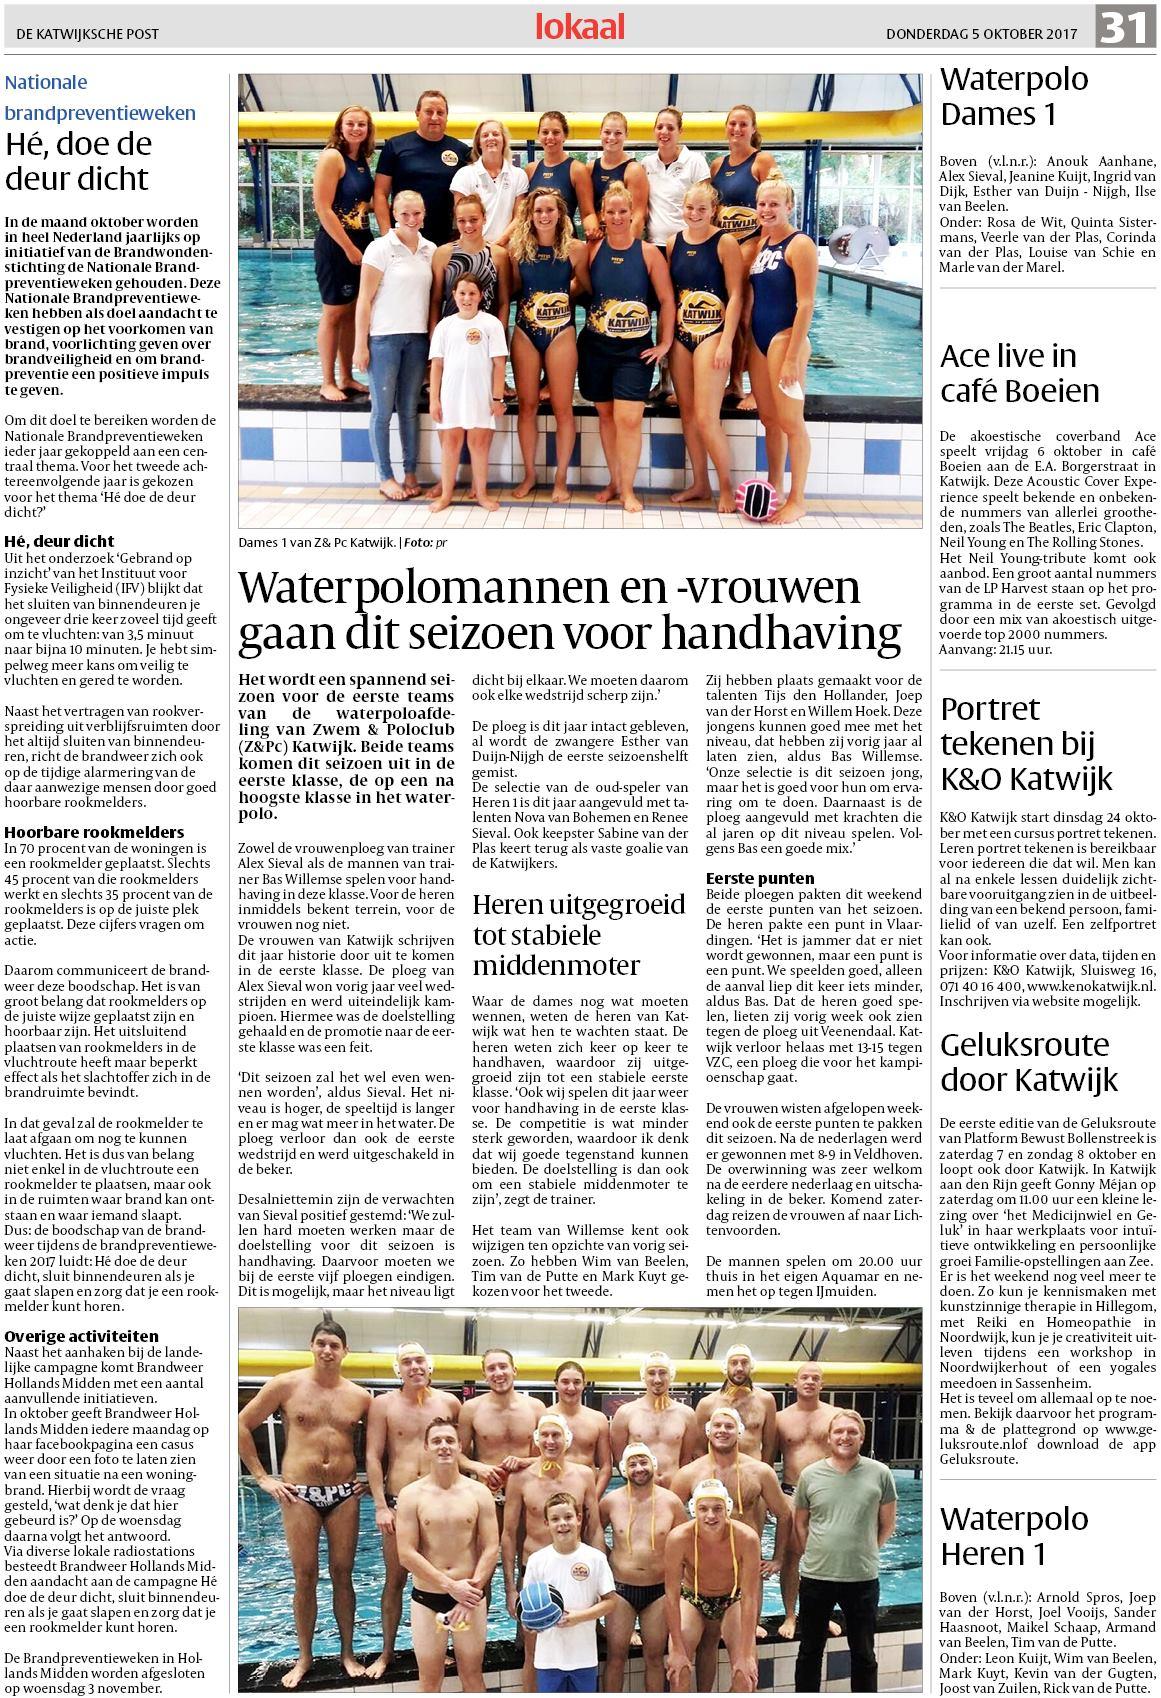 a9e222fb9a1 De Katwijksche Post 5 oktober 2017